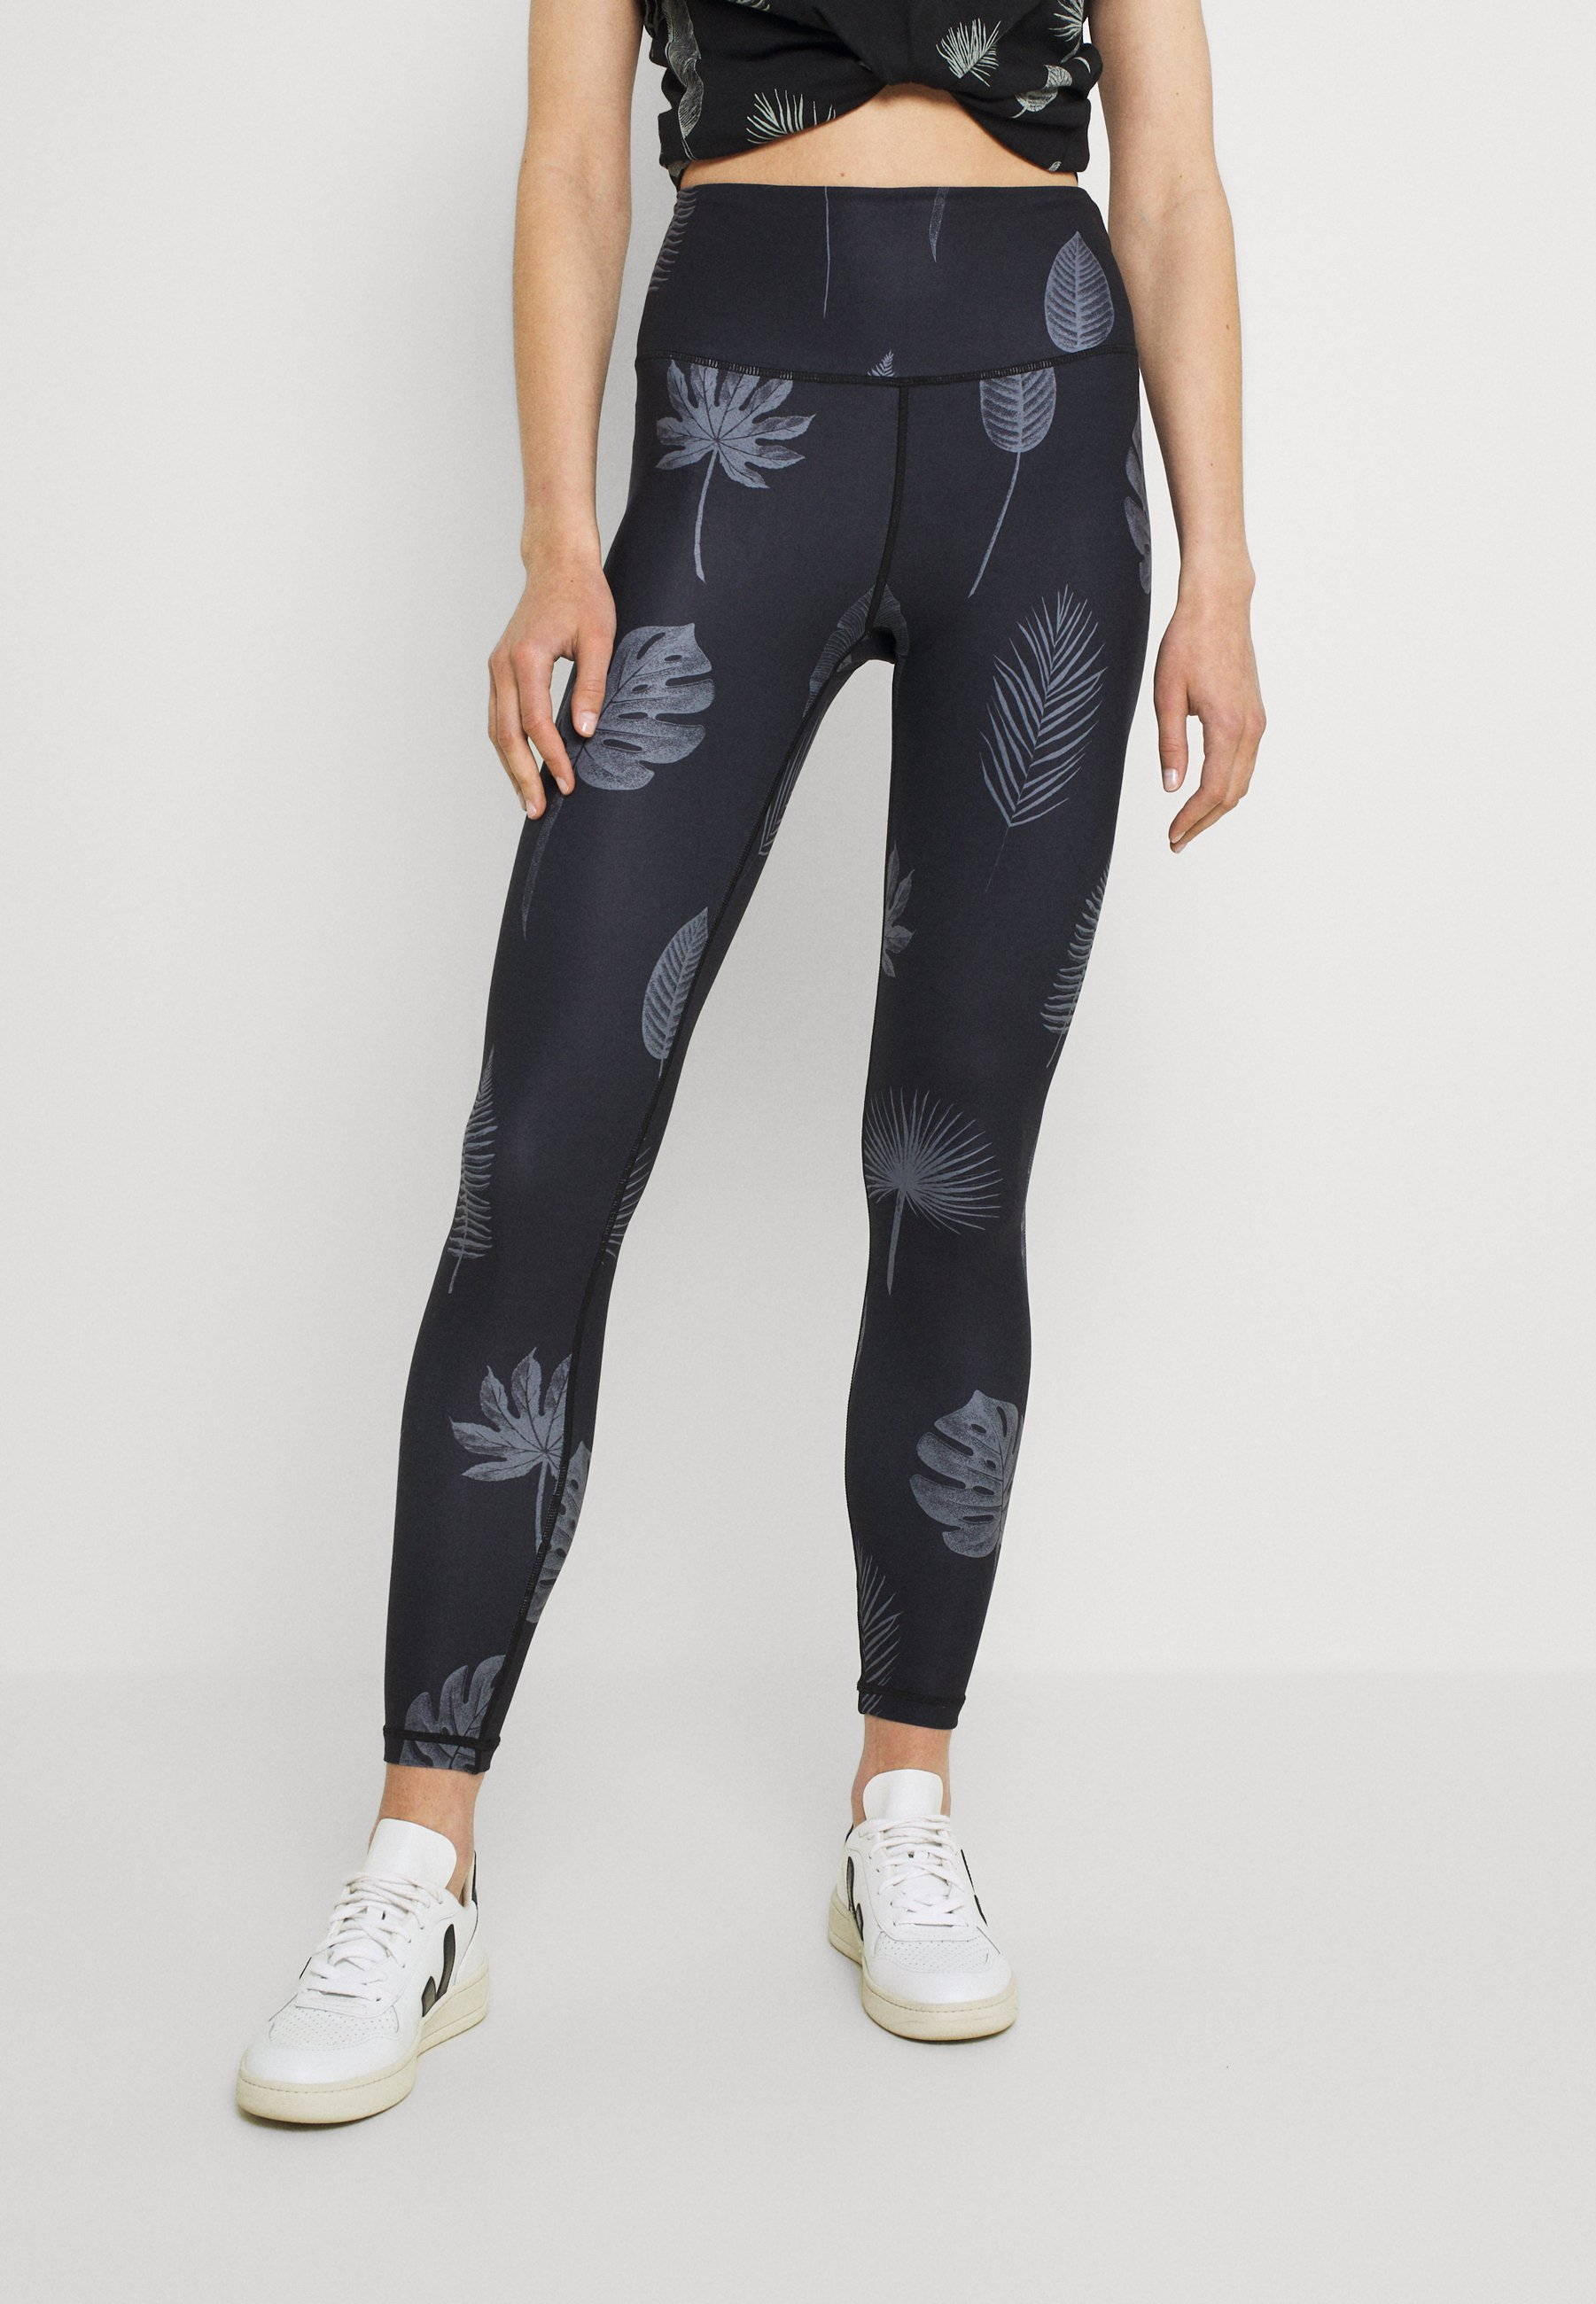 Women TIGHTS KAXHOLMEN TROPIC LEAVES - Leggings - Trousers